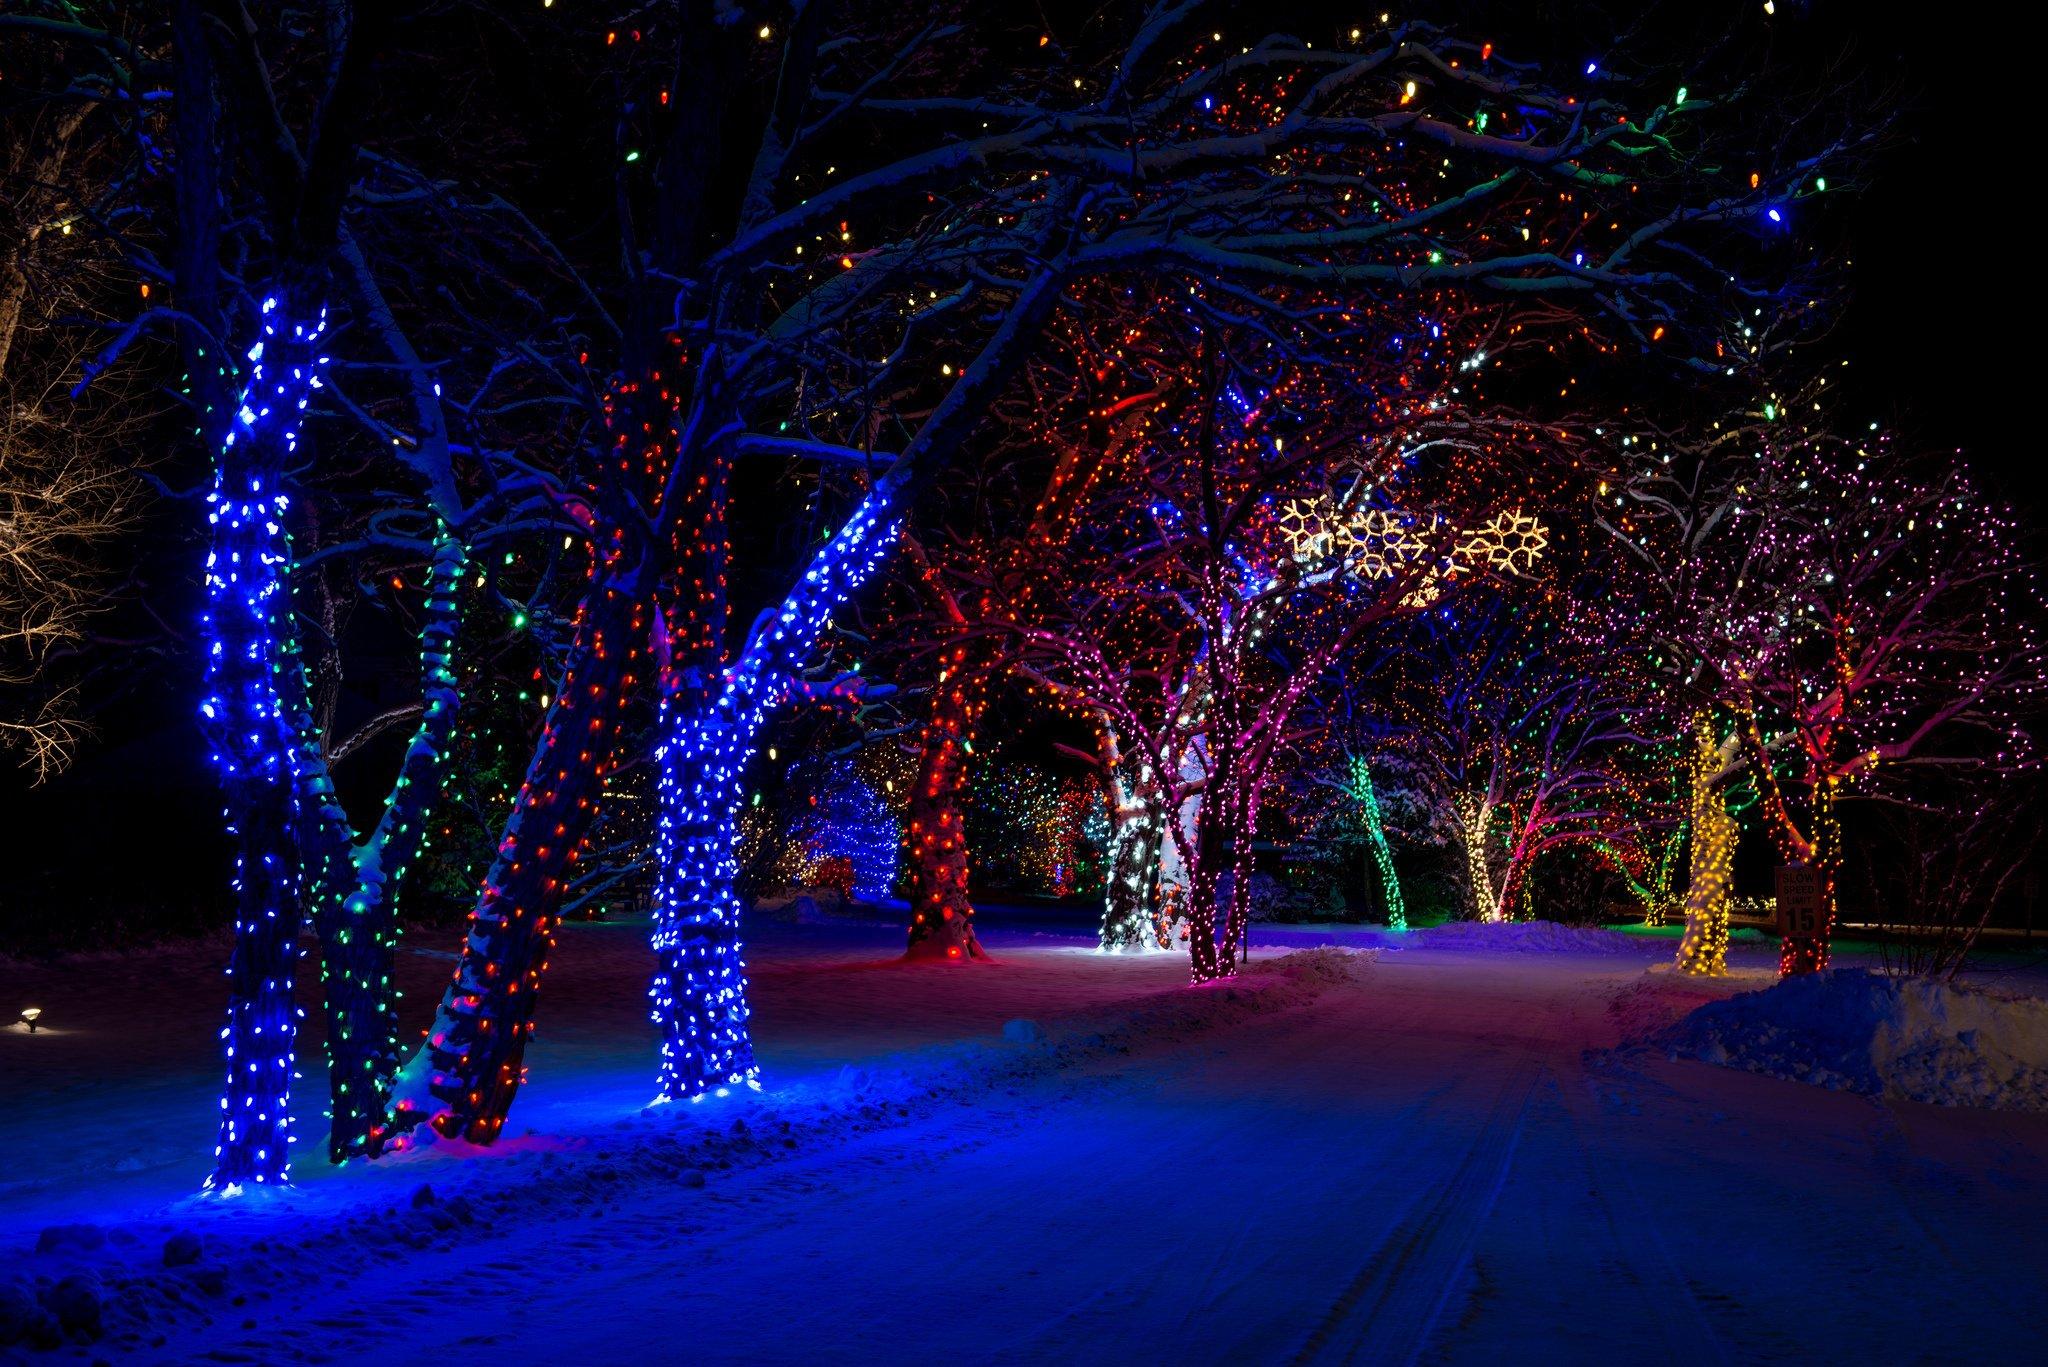 christmas night wallpaper,blue,nature,tree,light,lighting